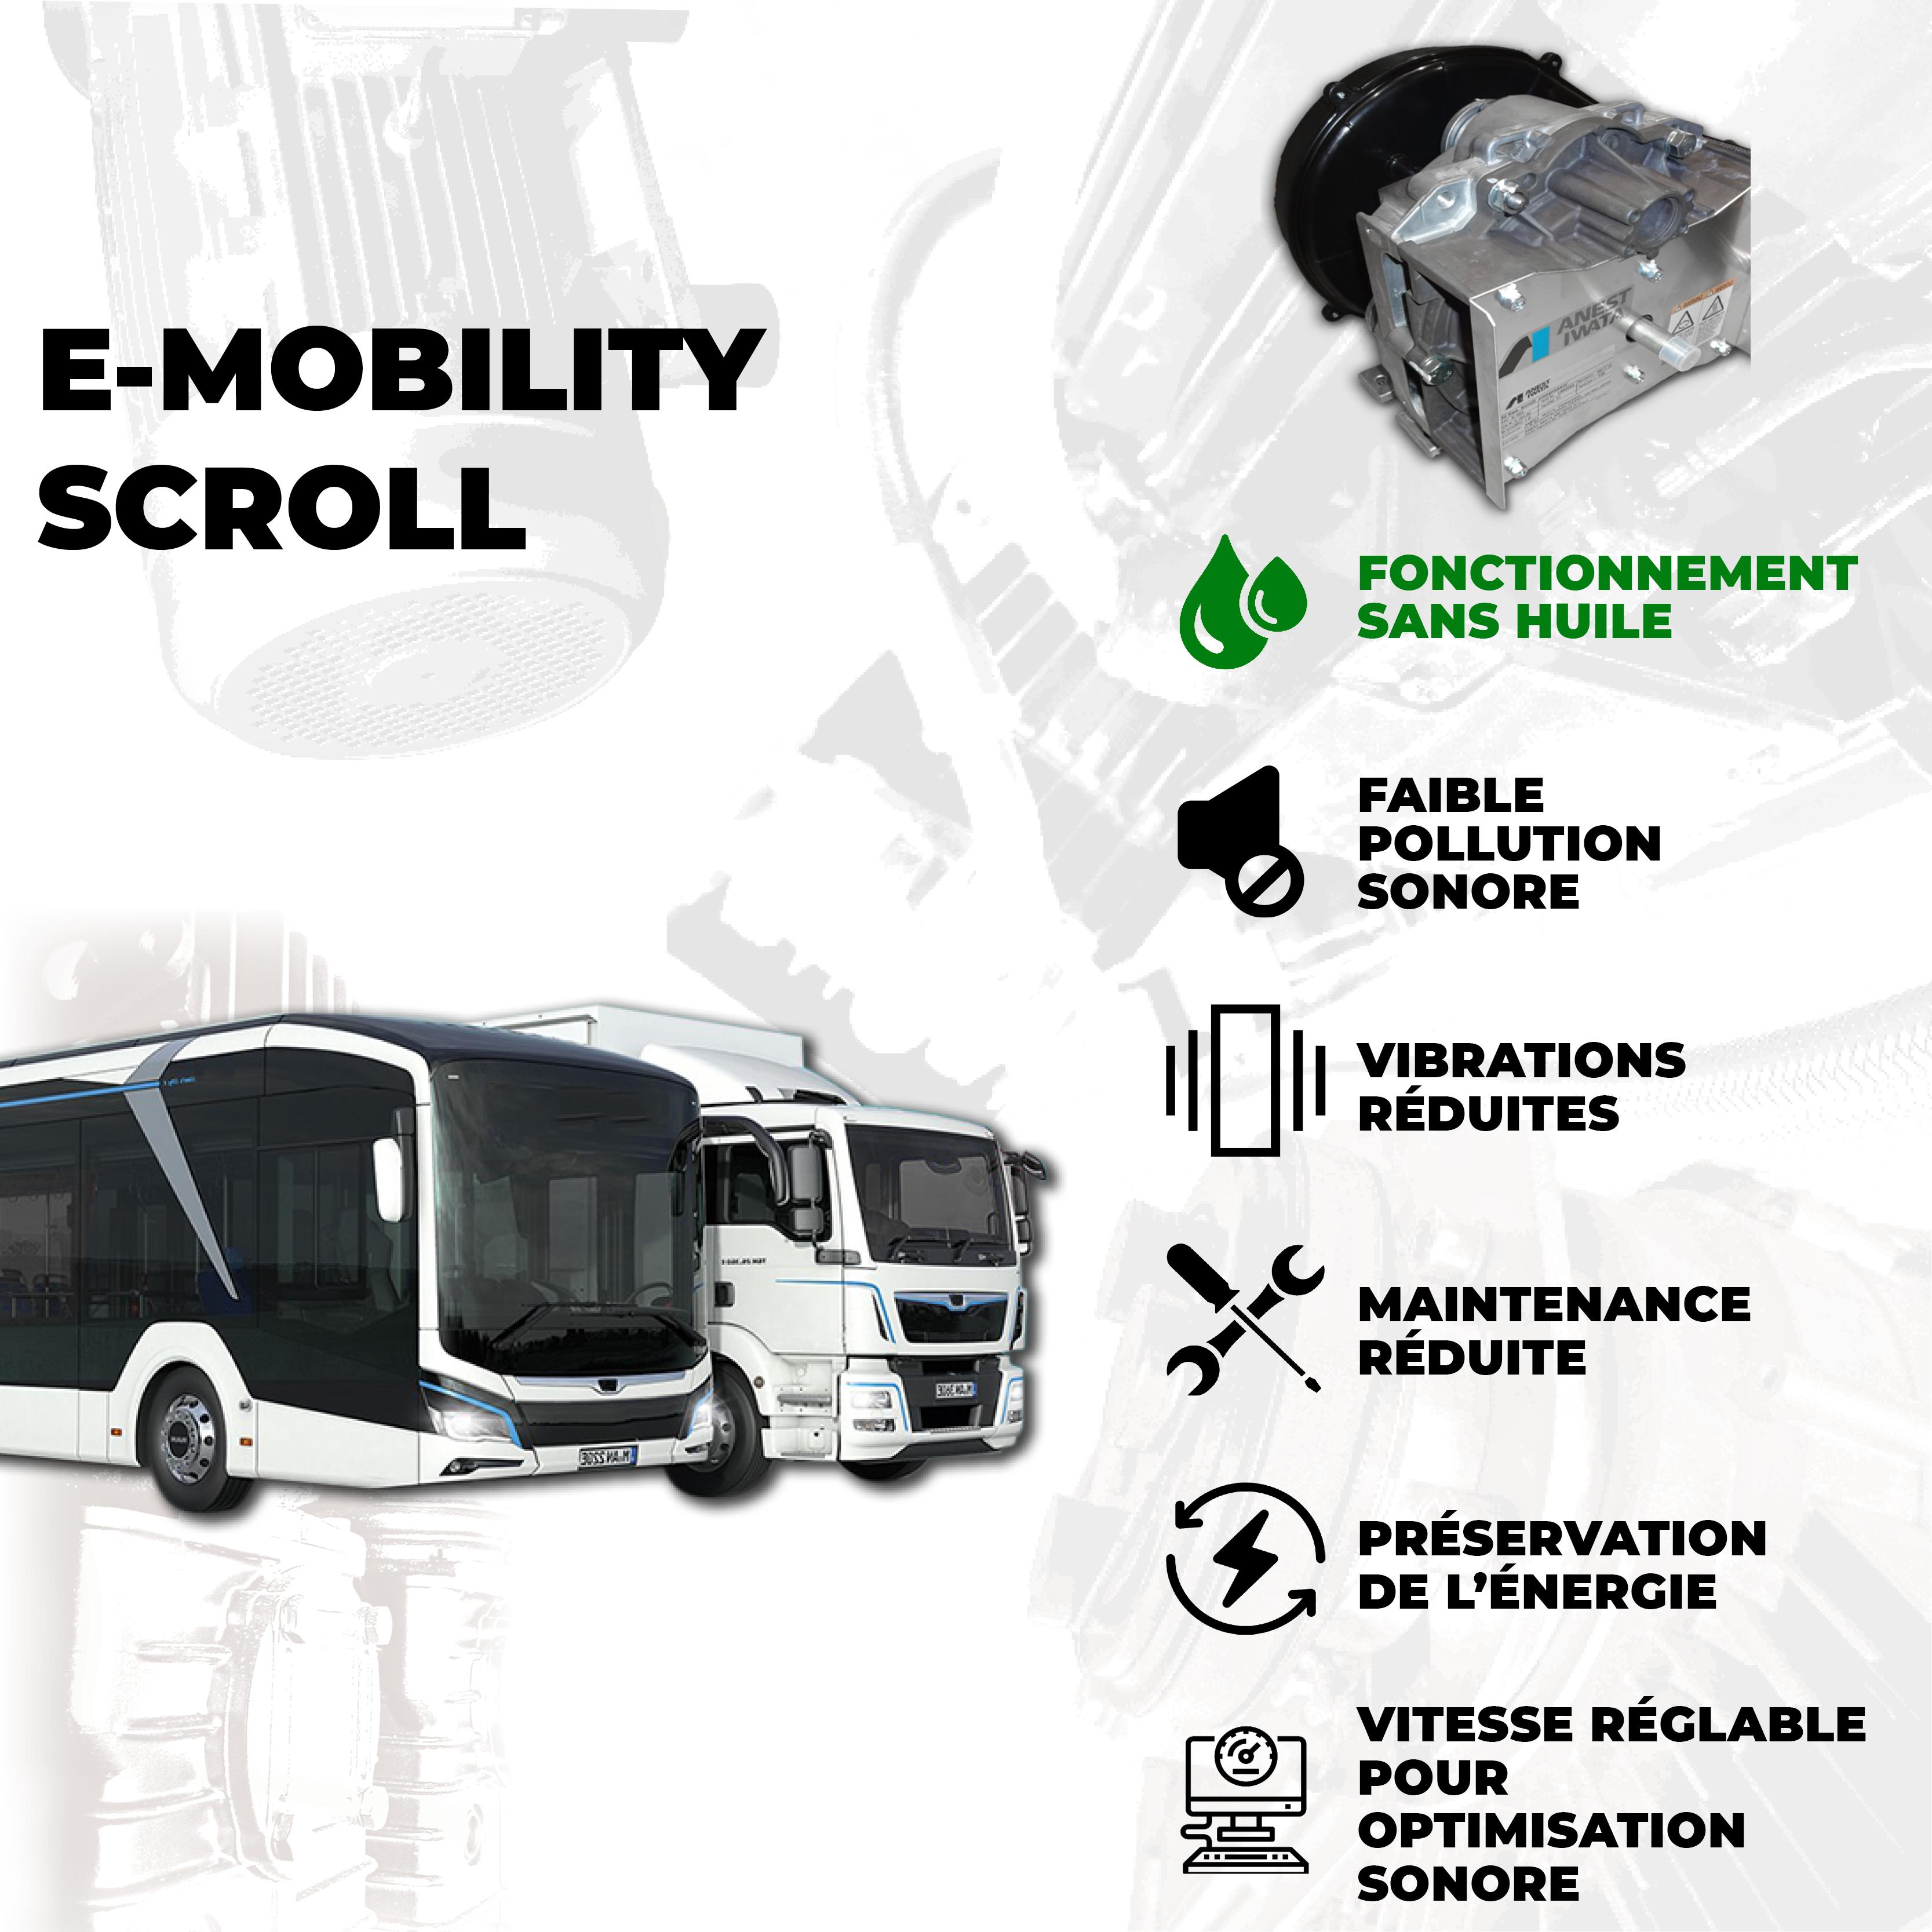 e-mobility-scroll